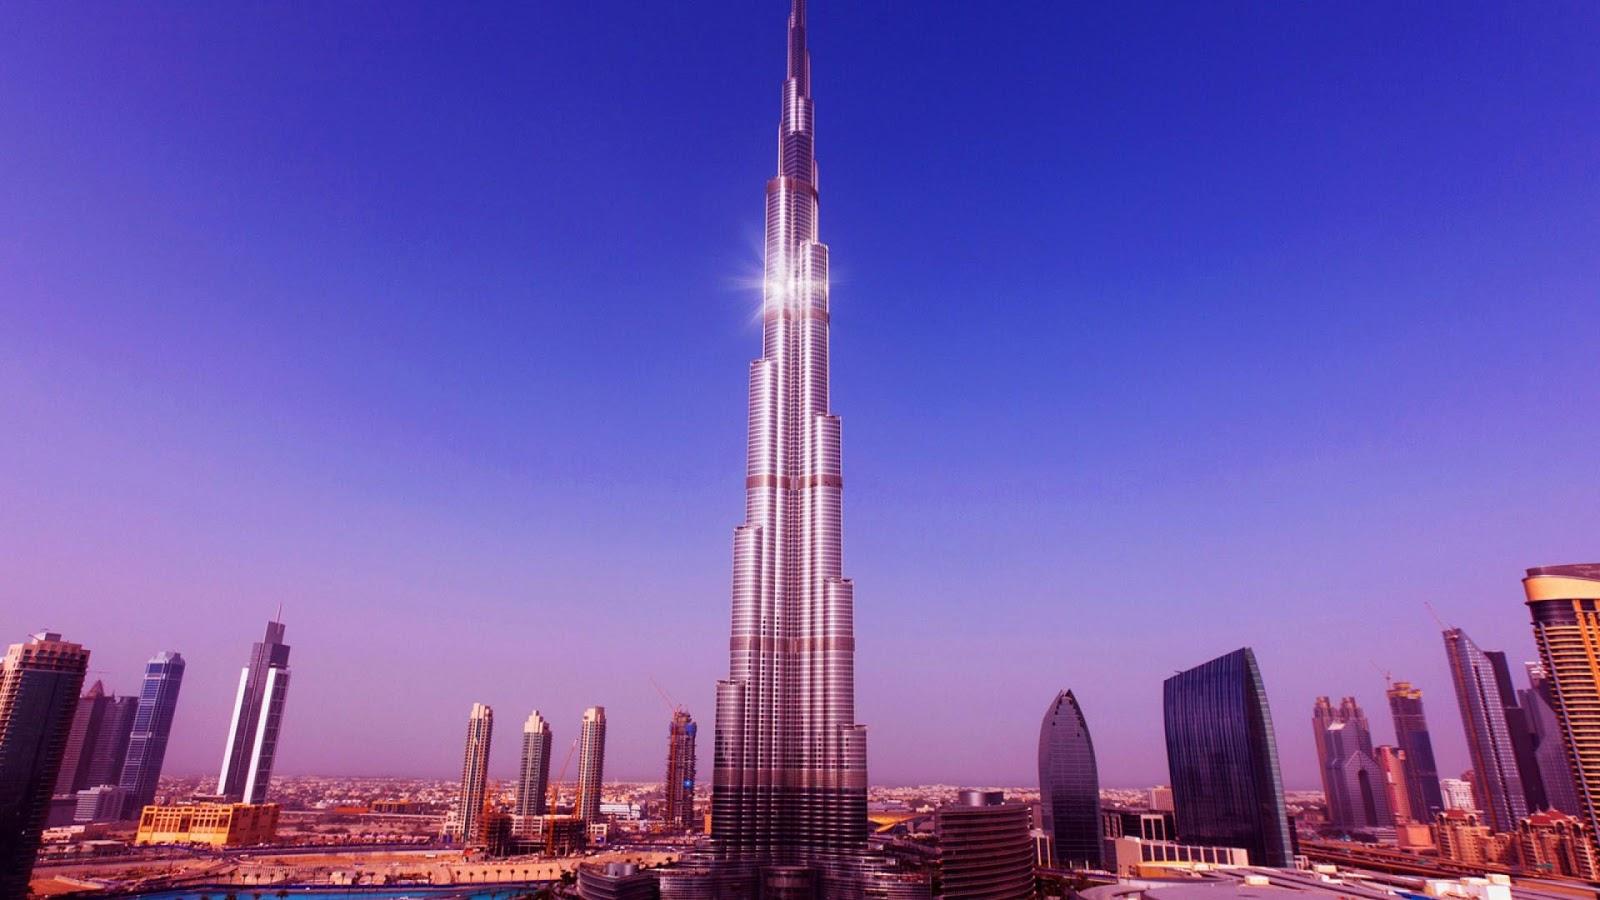 Wallpapers: Burj Khalifa